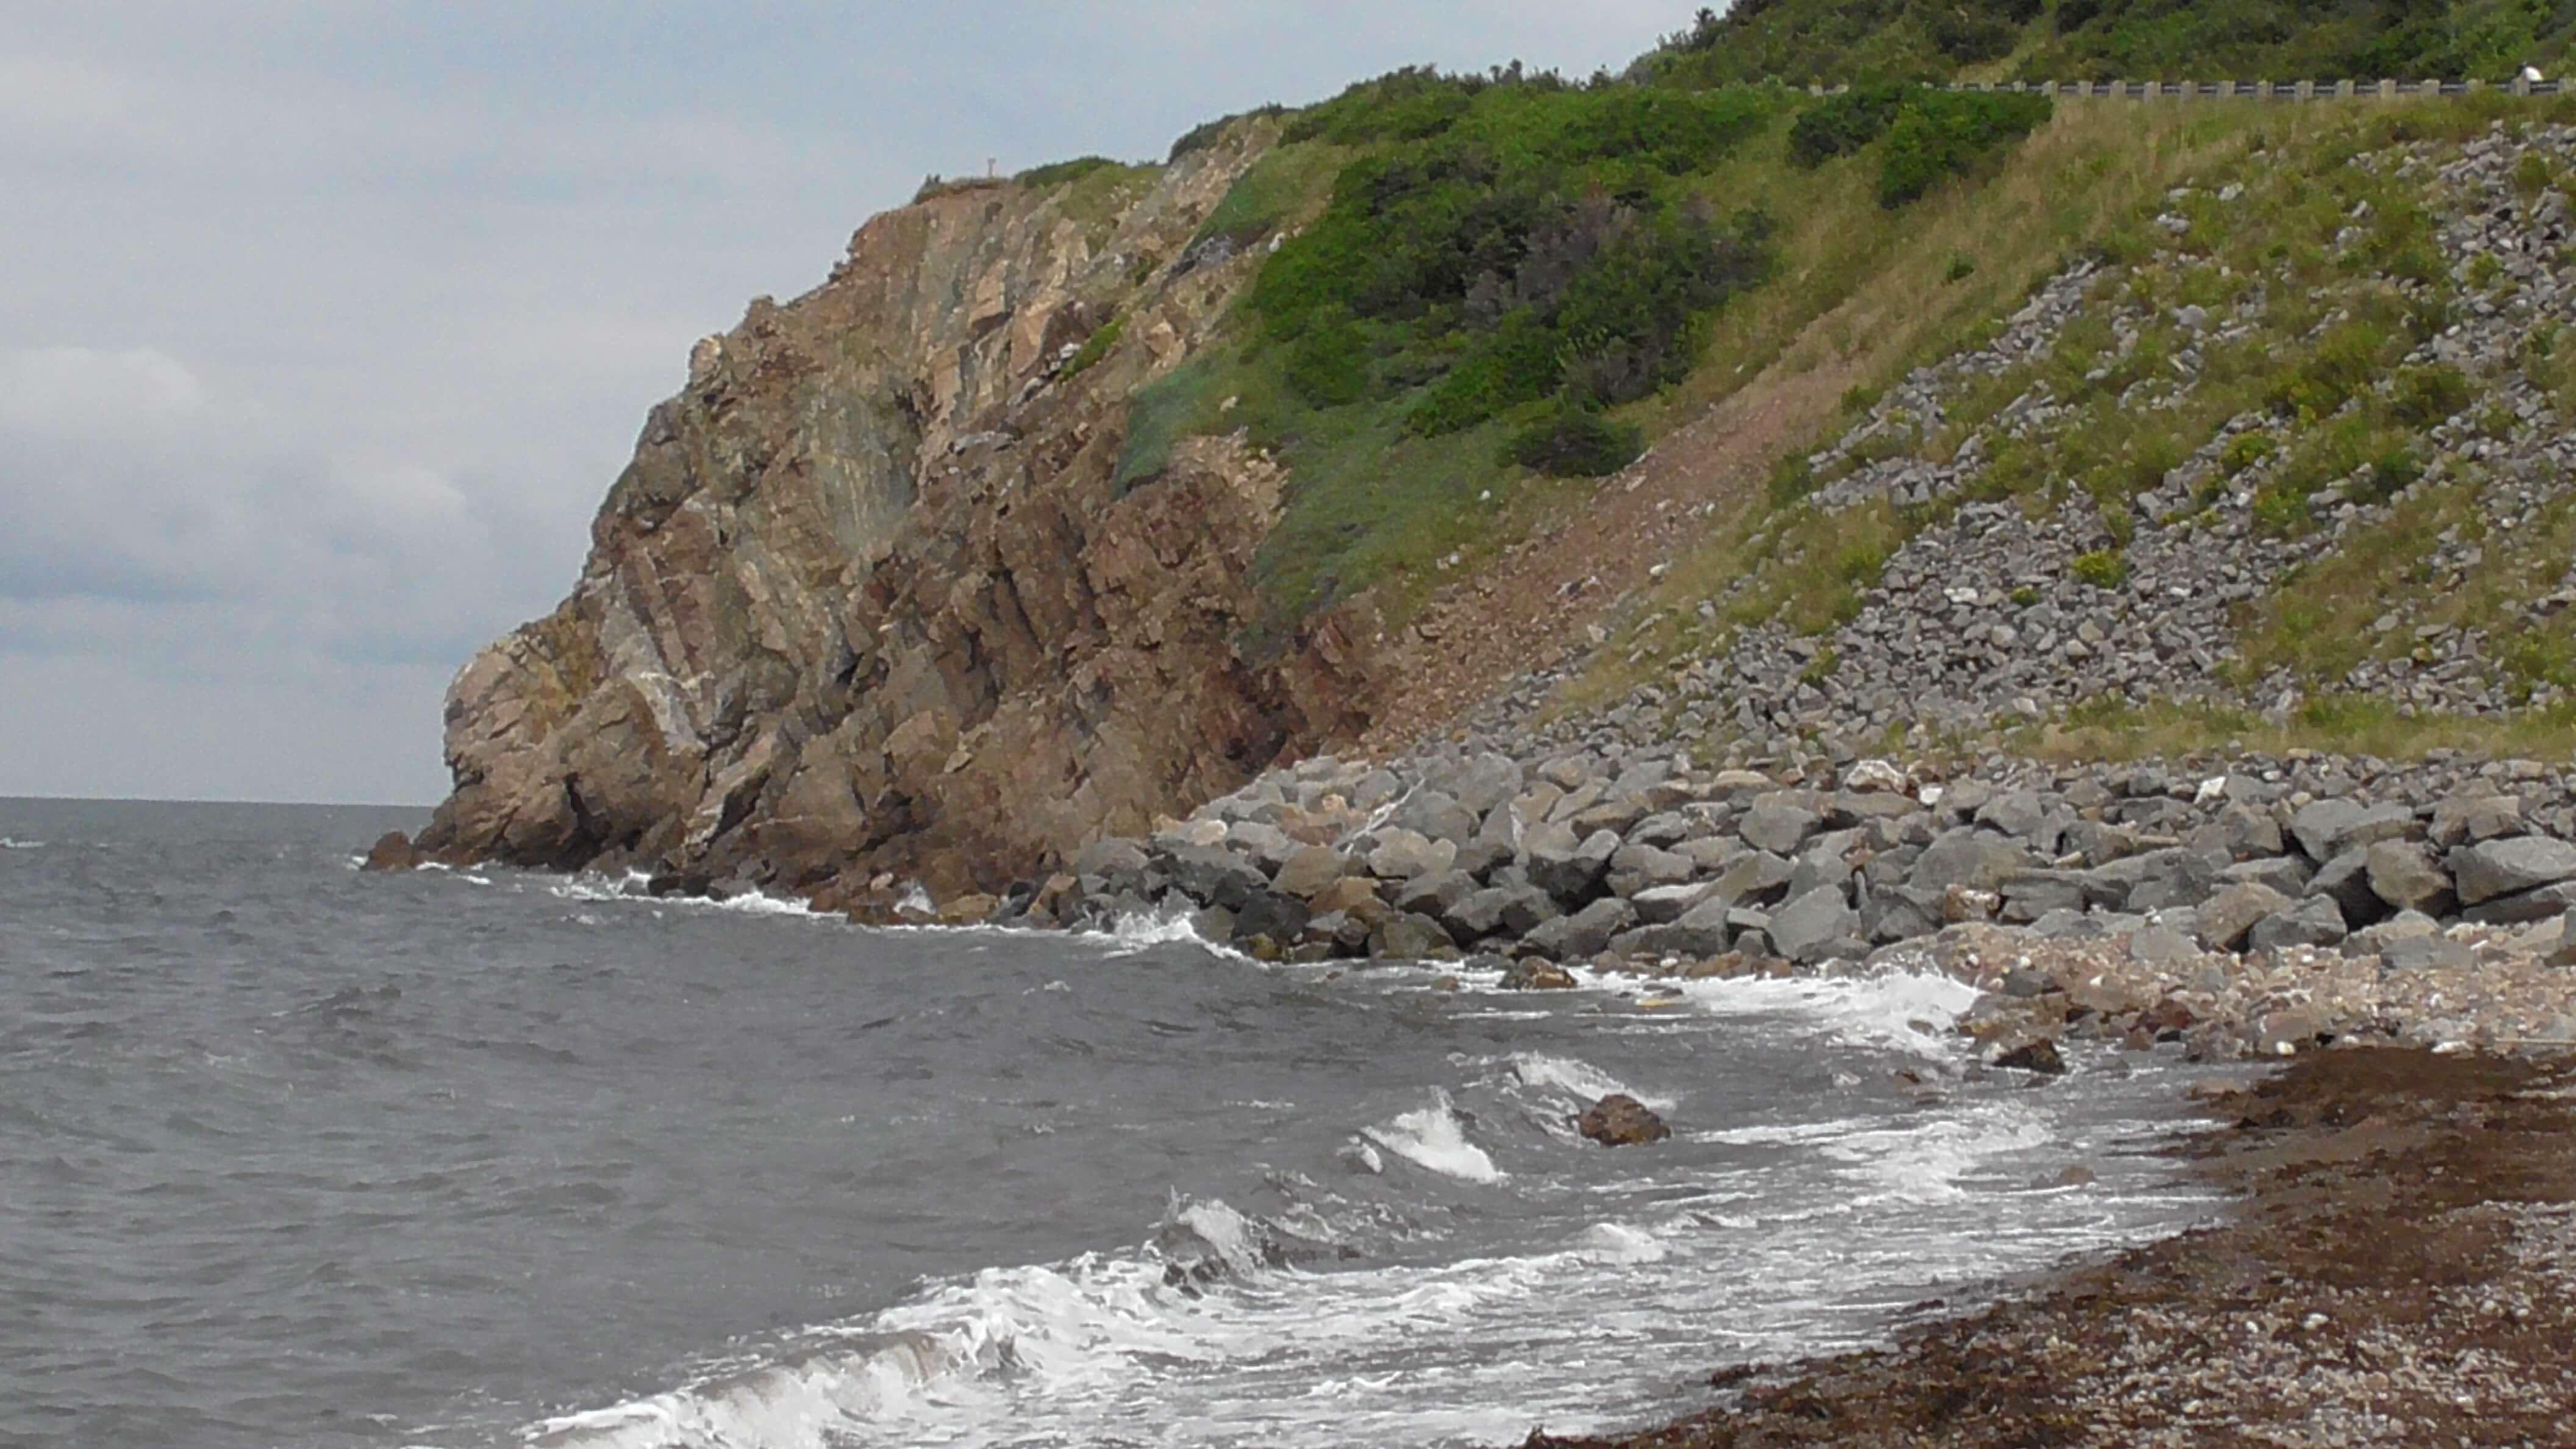 West Side, Cape Breton Highlands National Park, Nova Scotia